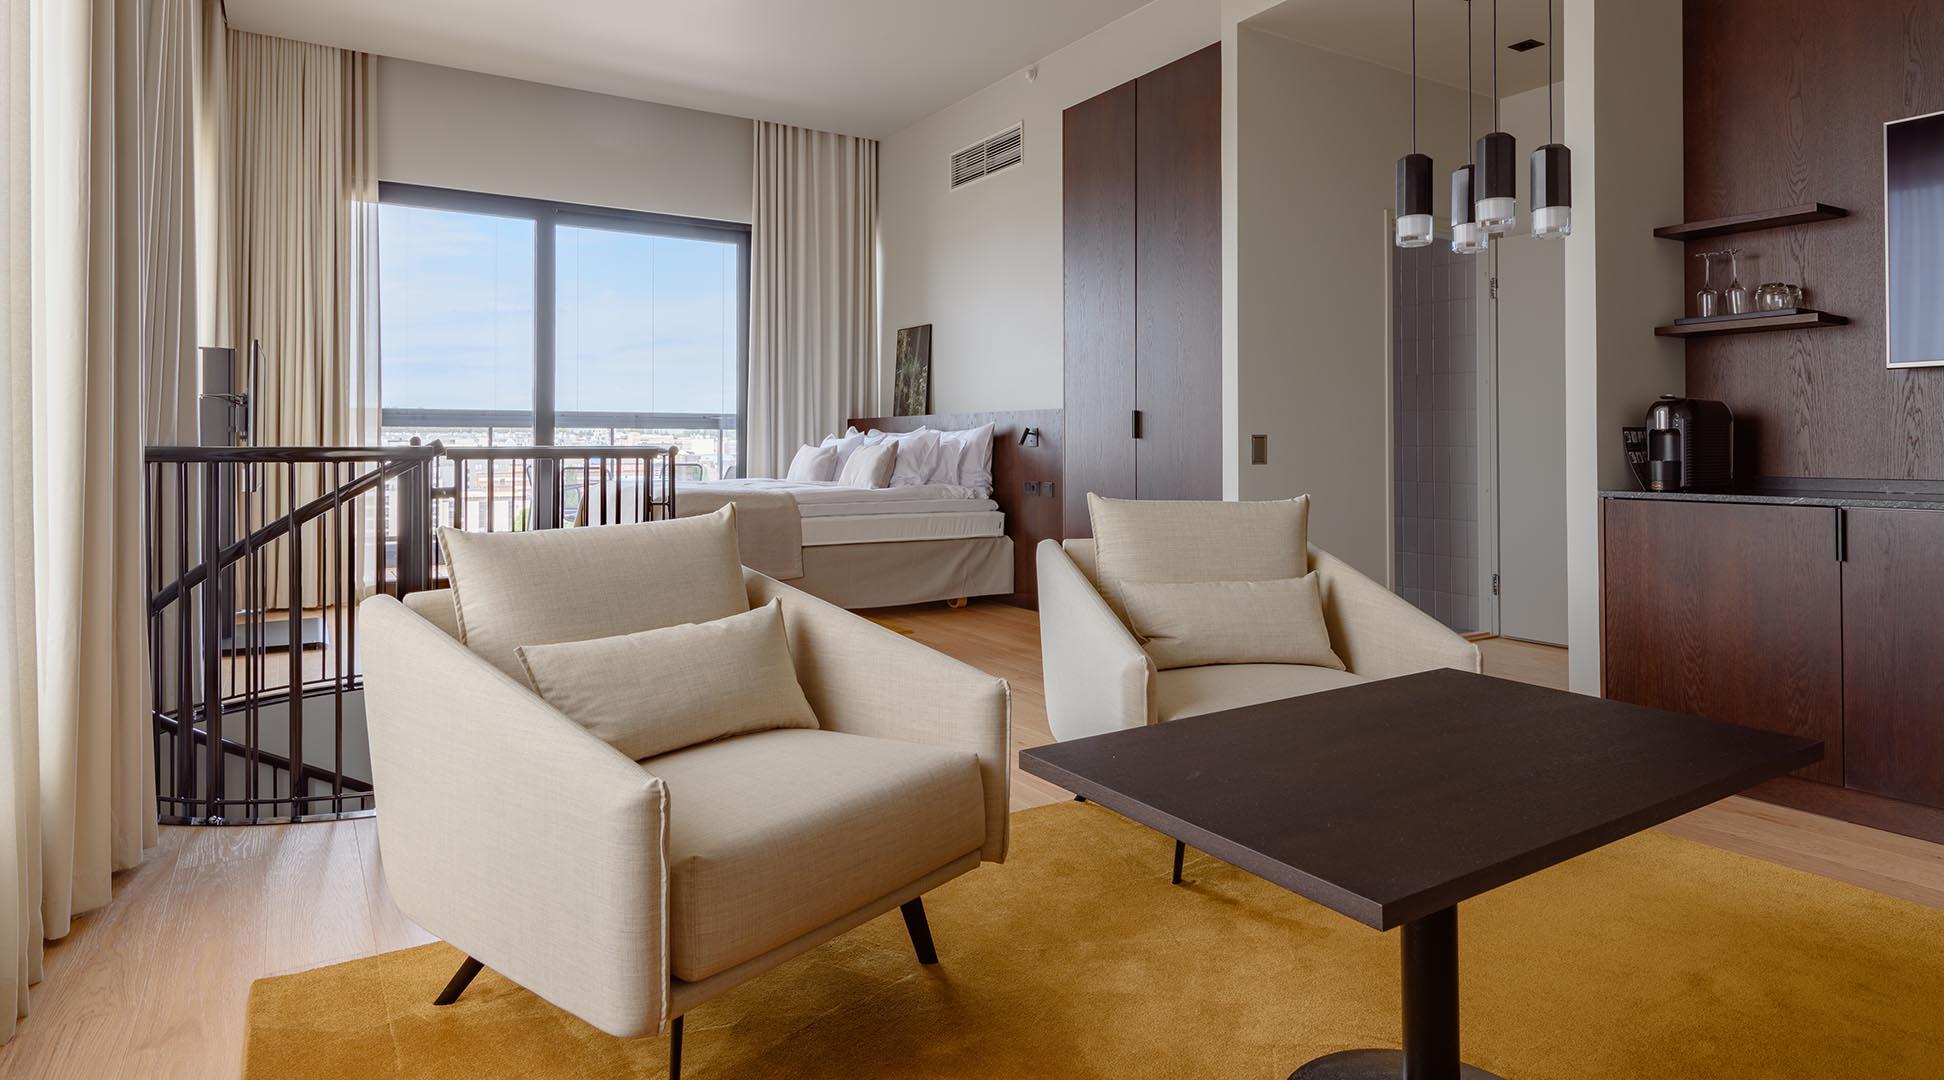 Solo Sokos Hotel Paviljonki: No ordinary hotel, Scan Magazine